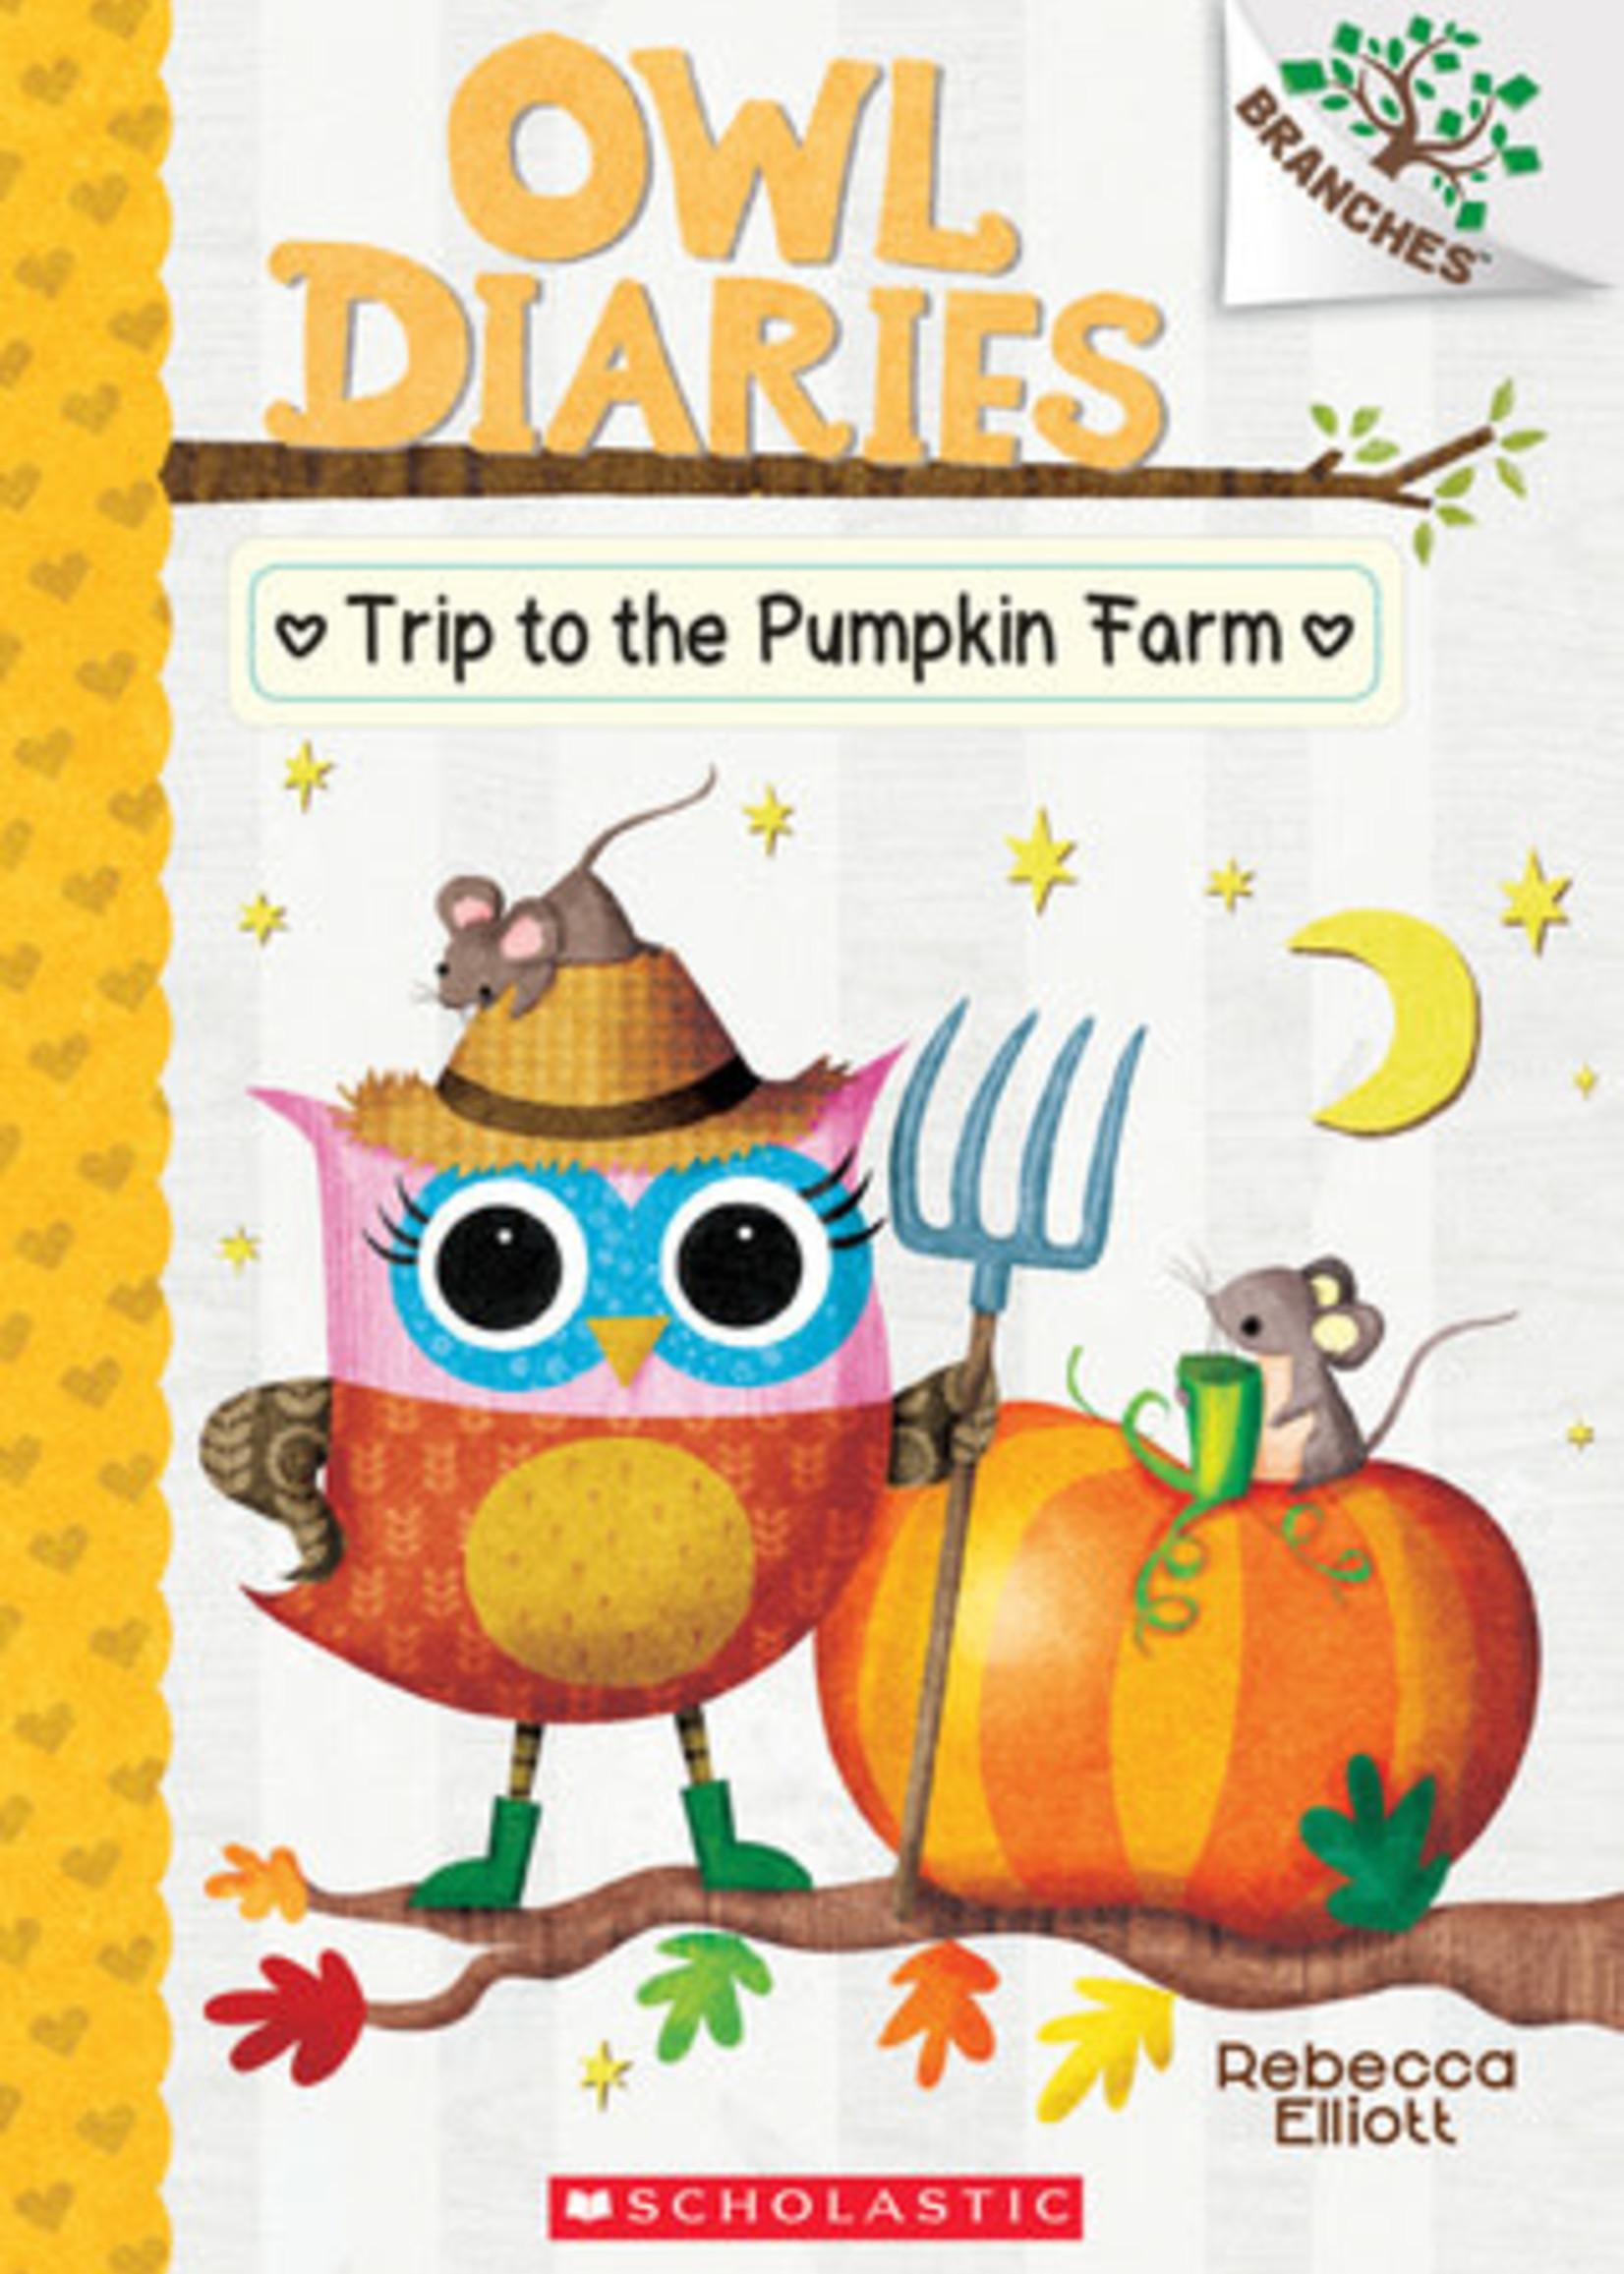 Trip to the Pumpkin Farm by Rebecca Elliott